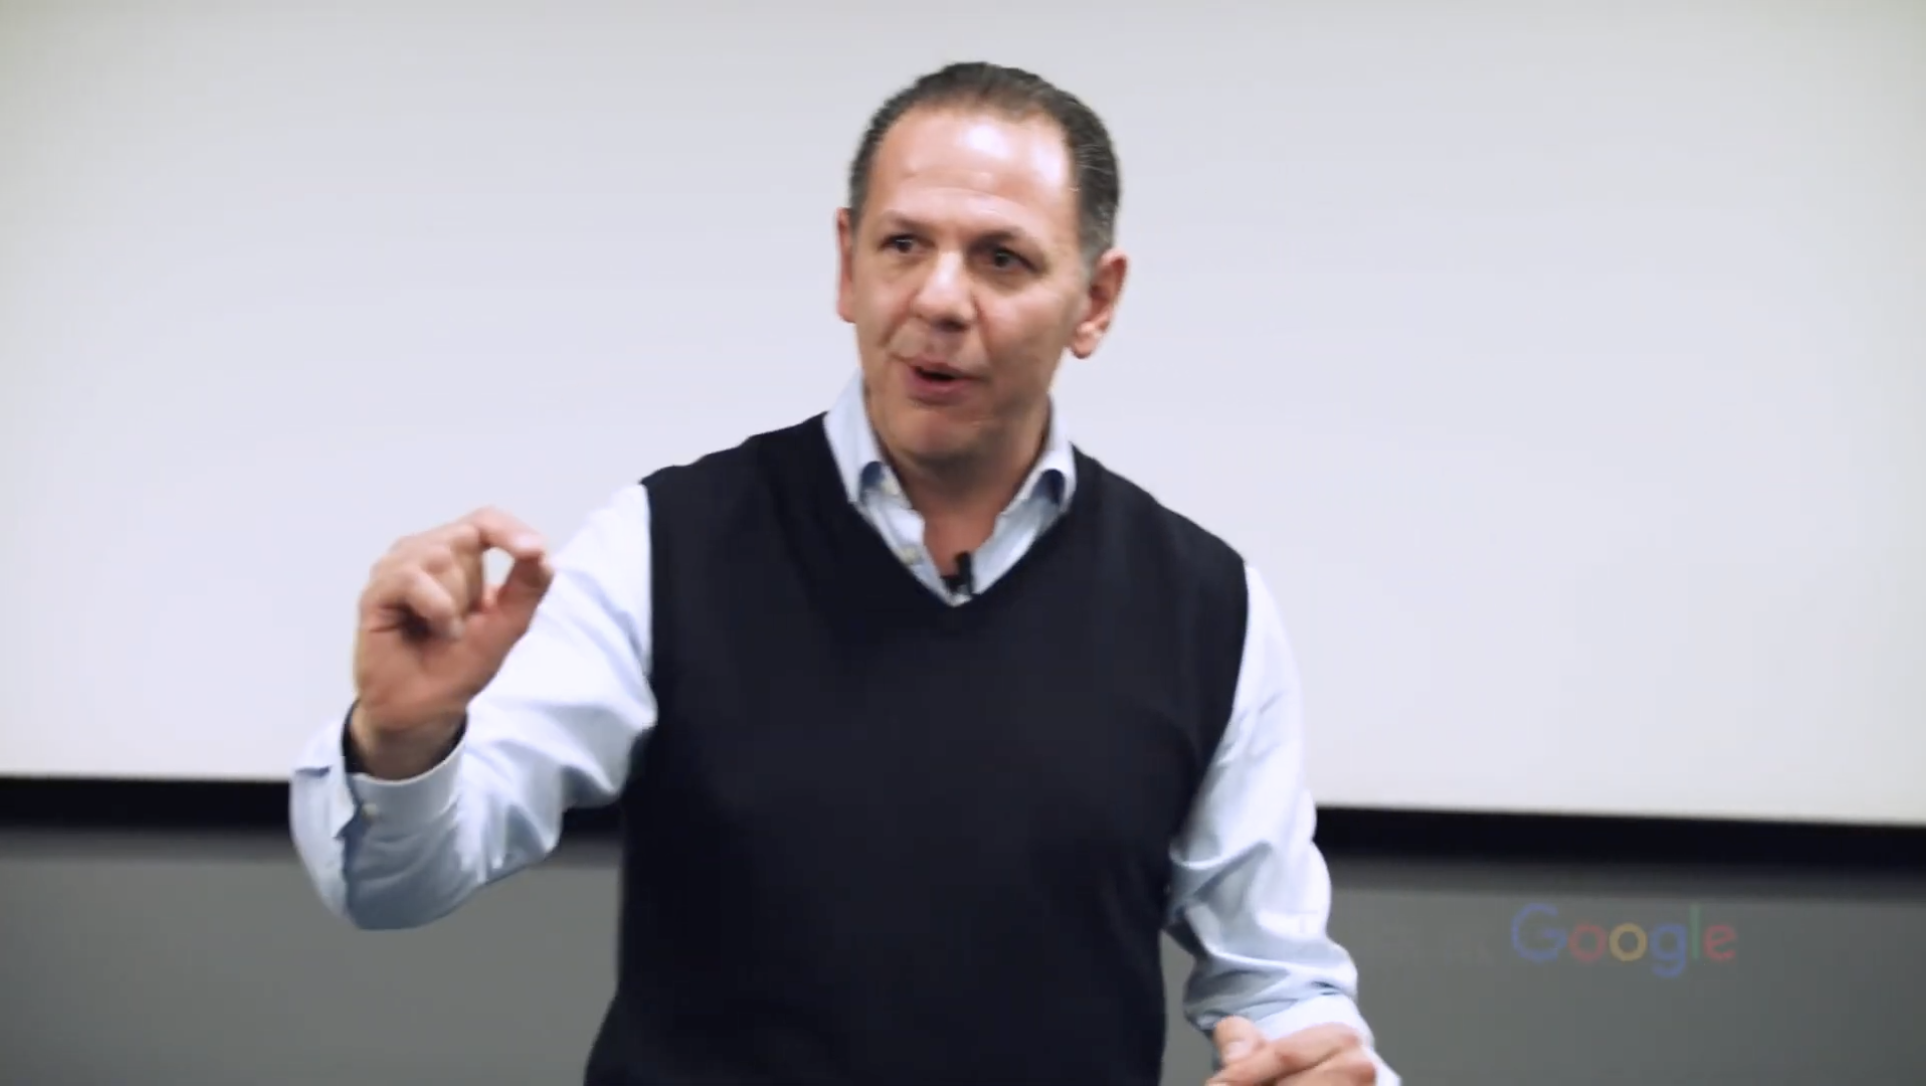 Michael Virardi - Virardi's Q&A session @ Google